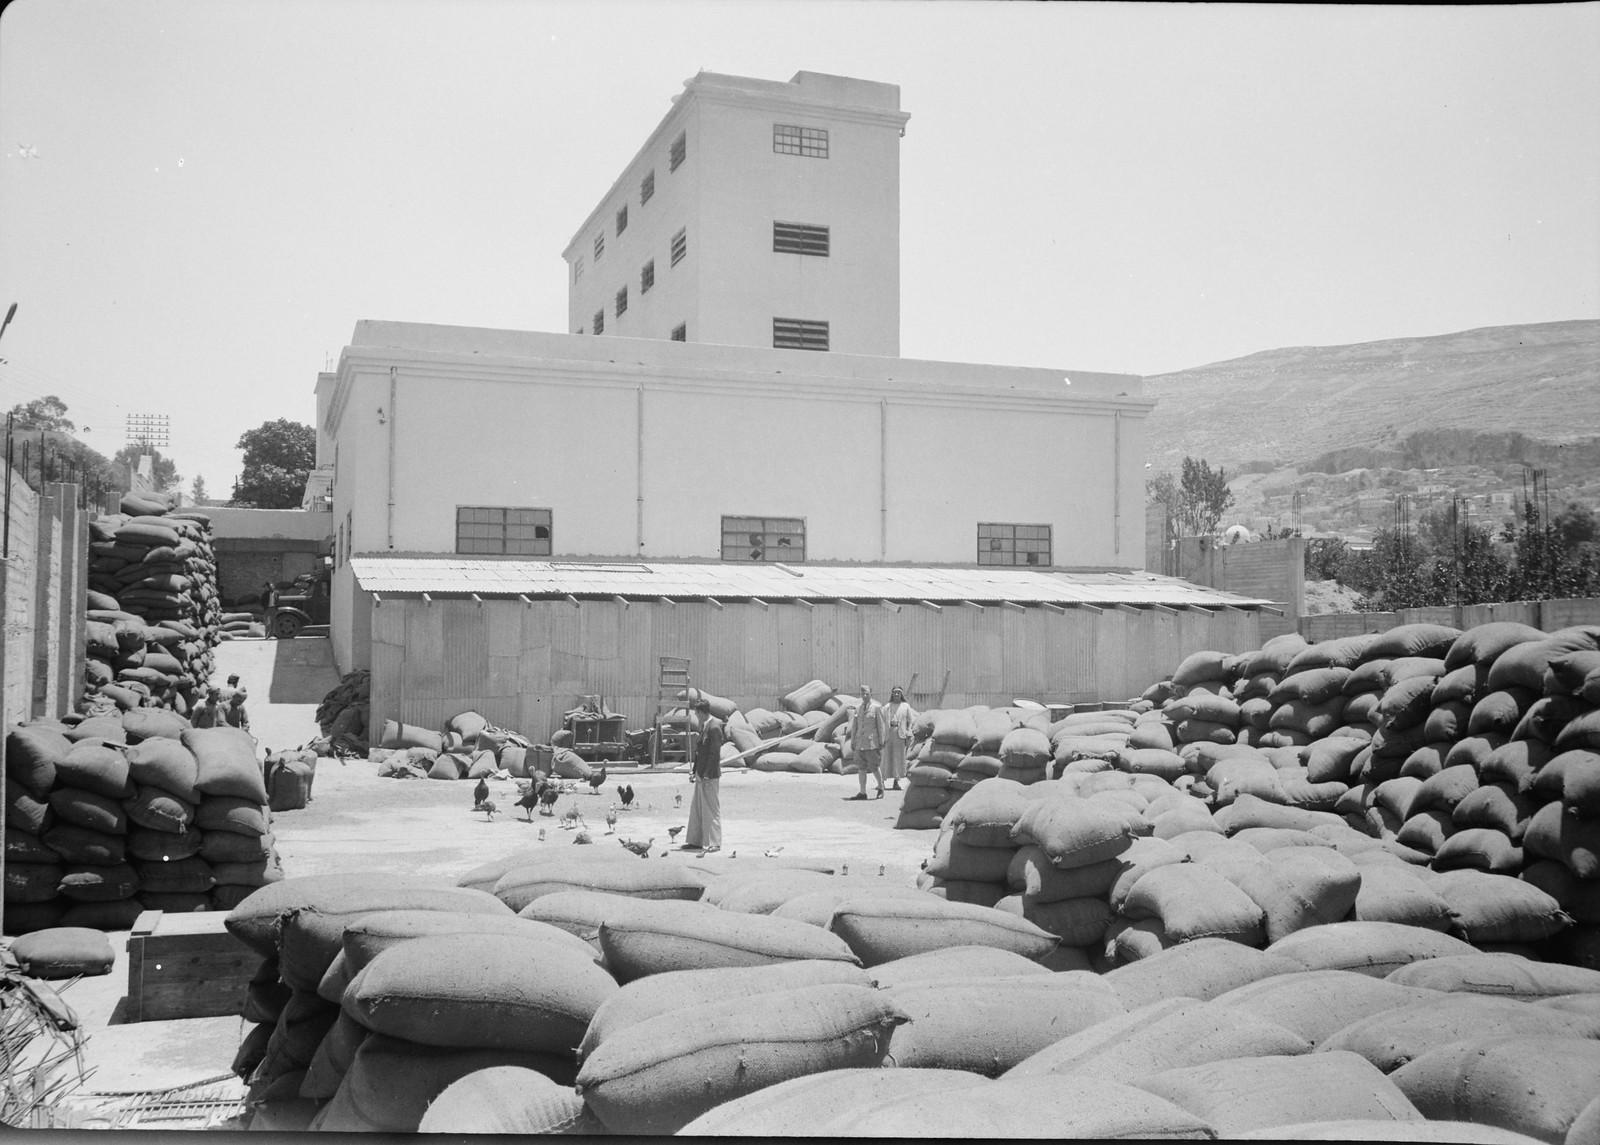 08. 1940. Шхем. The Naameh Flour Mills Ltd. Общий вид с запада